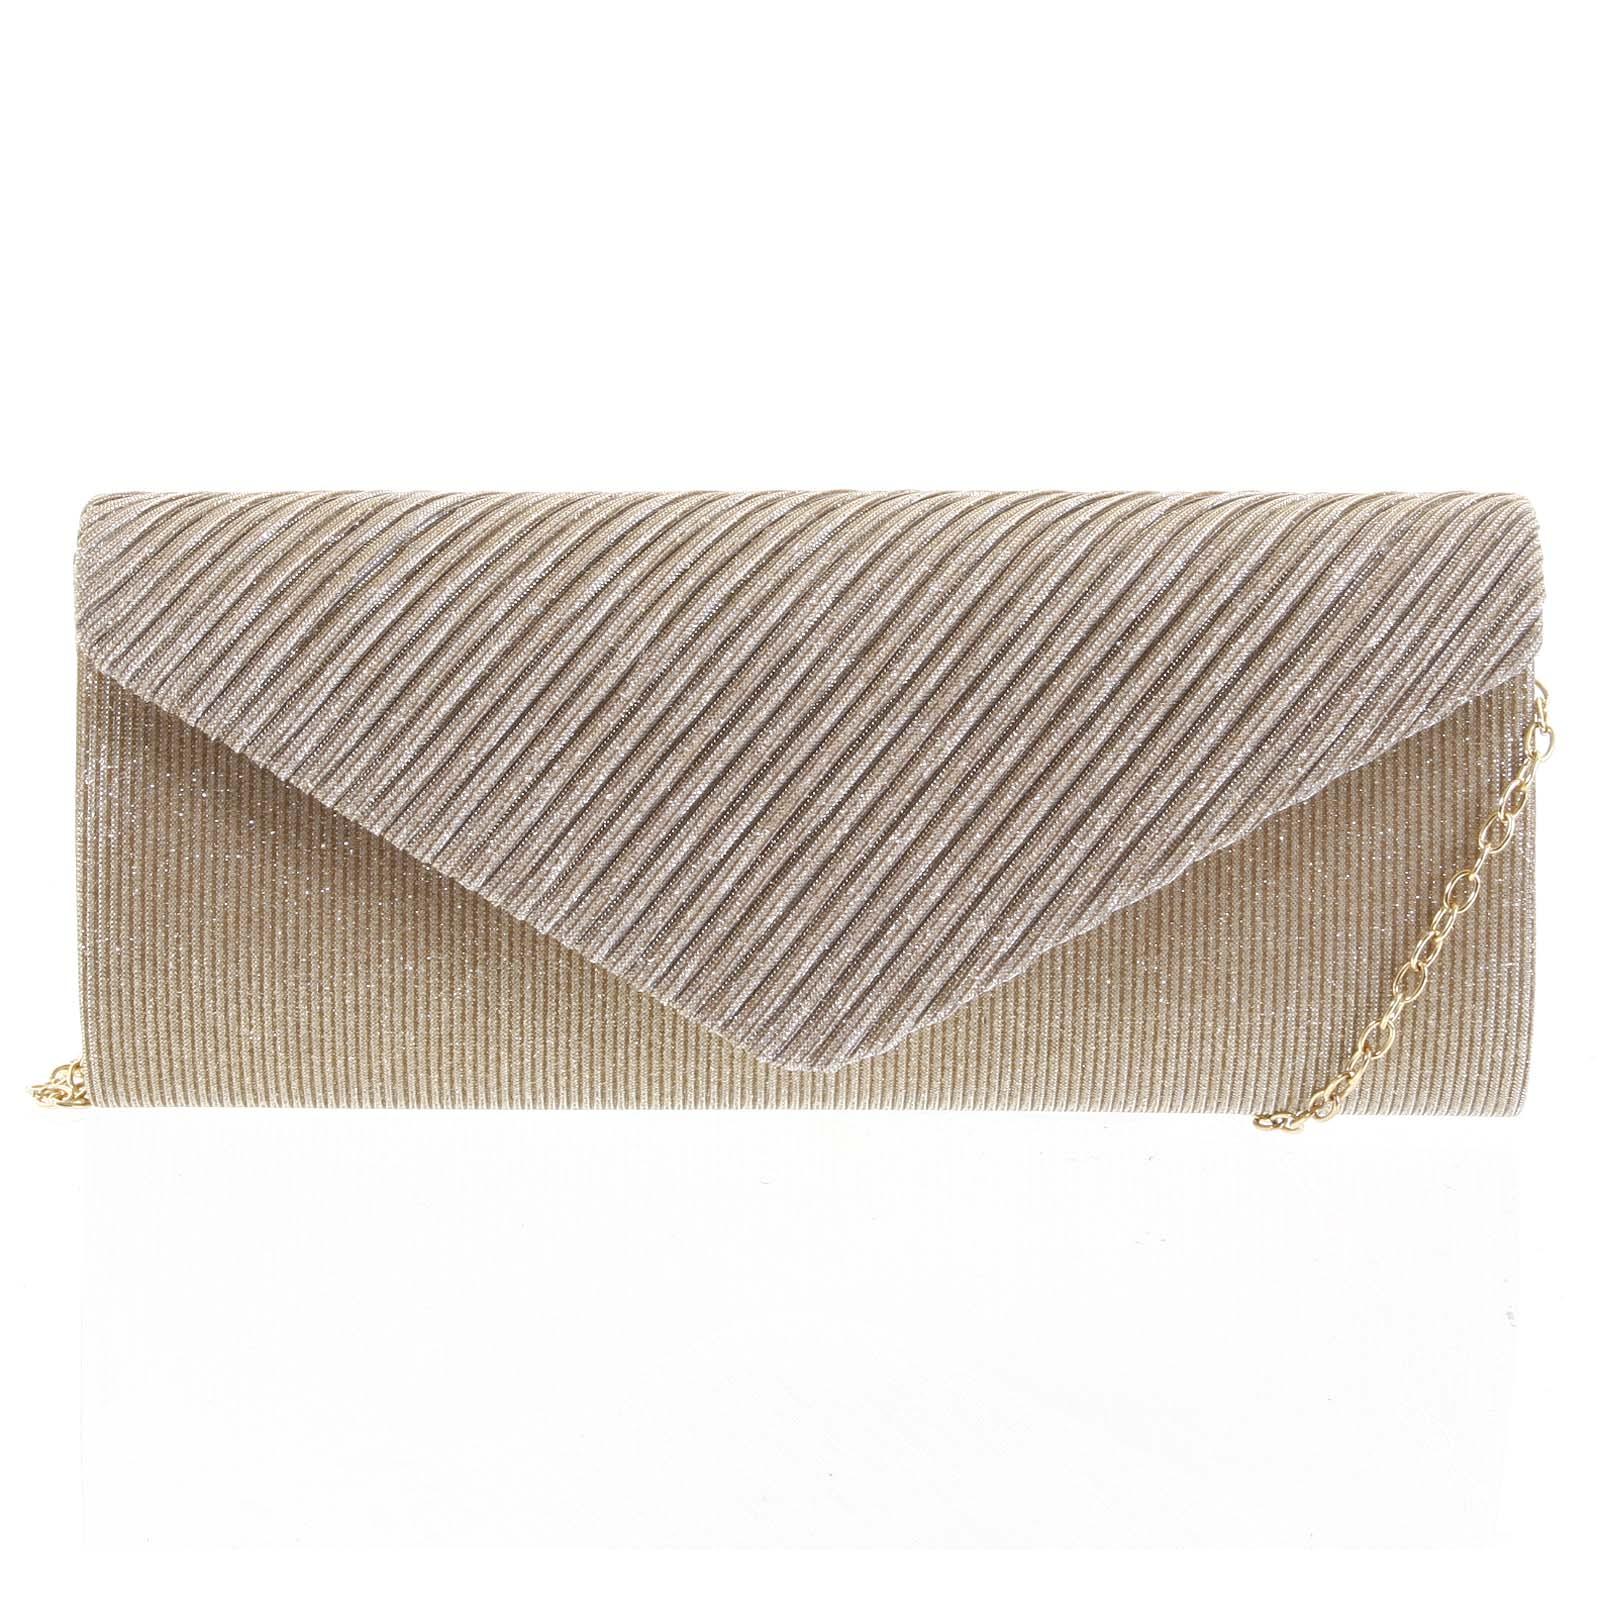 Dámská listová kabelka bronzová - Michelle Moon Deer